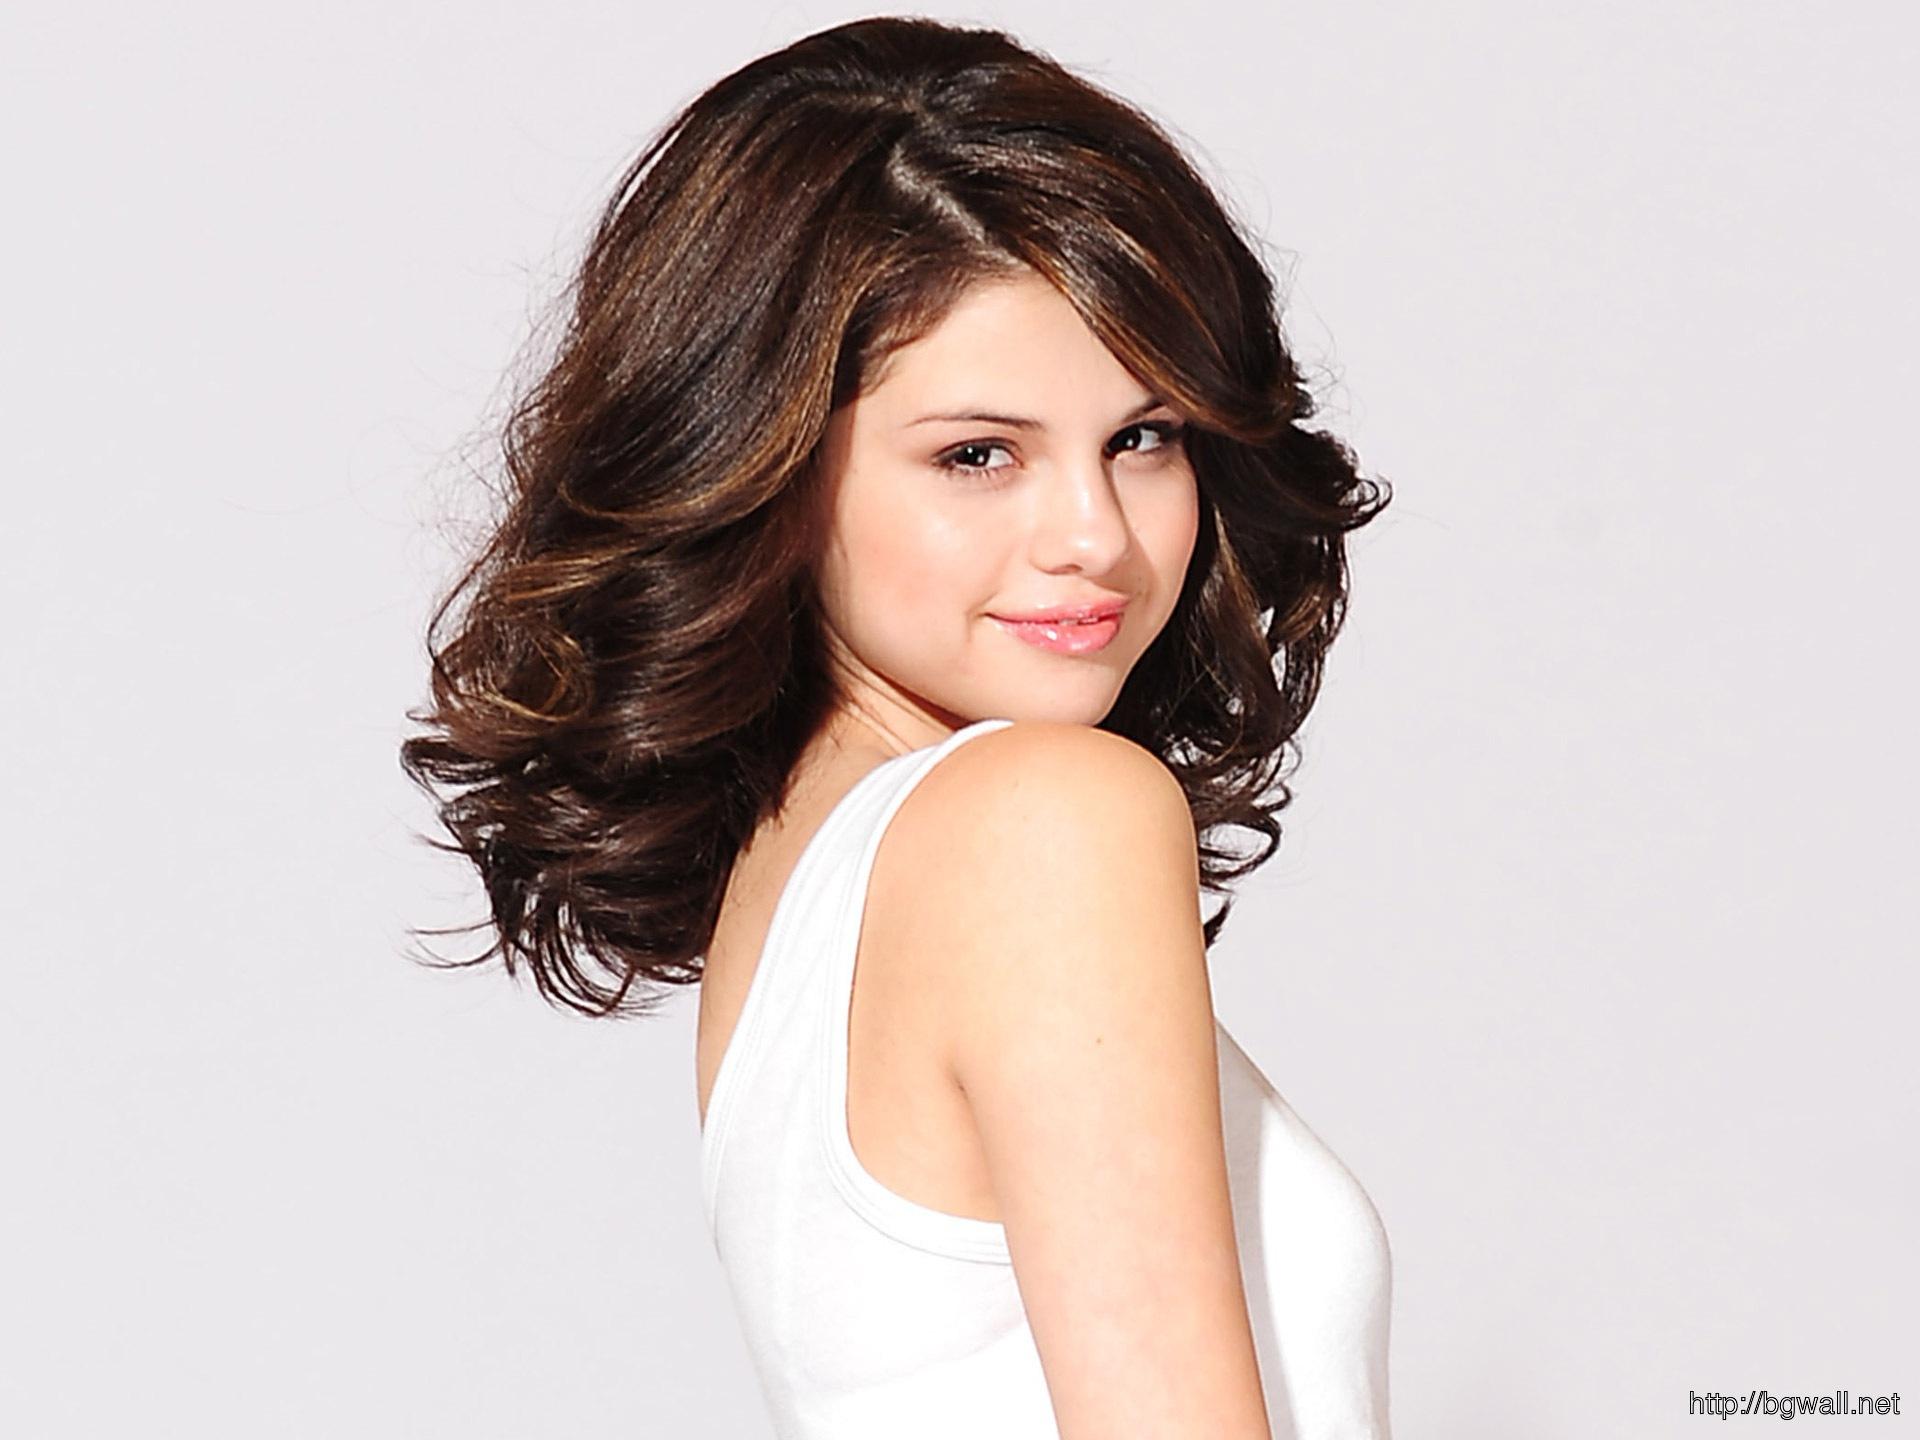 Selena gomez new wallpaper background wallpaper hd - Selena gomez latest hd wallpapers ...